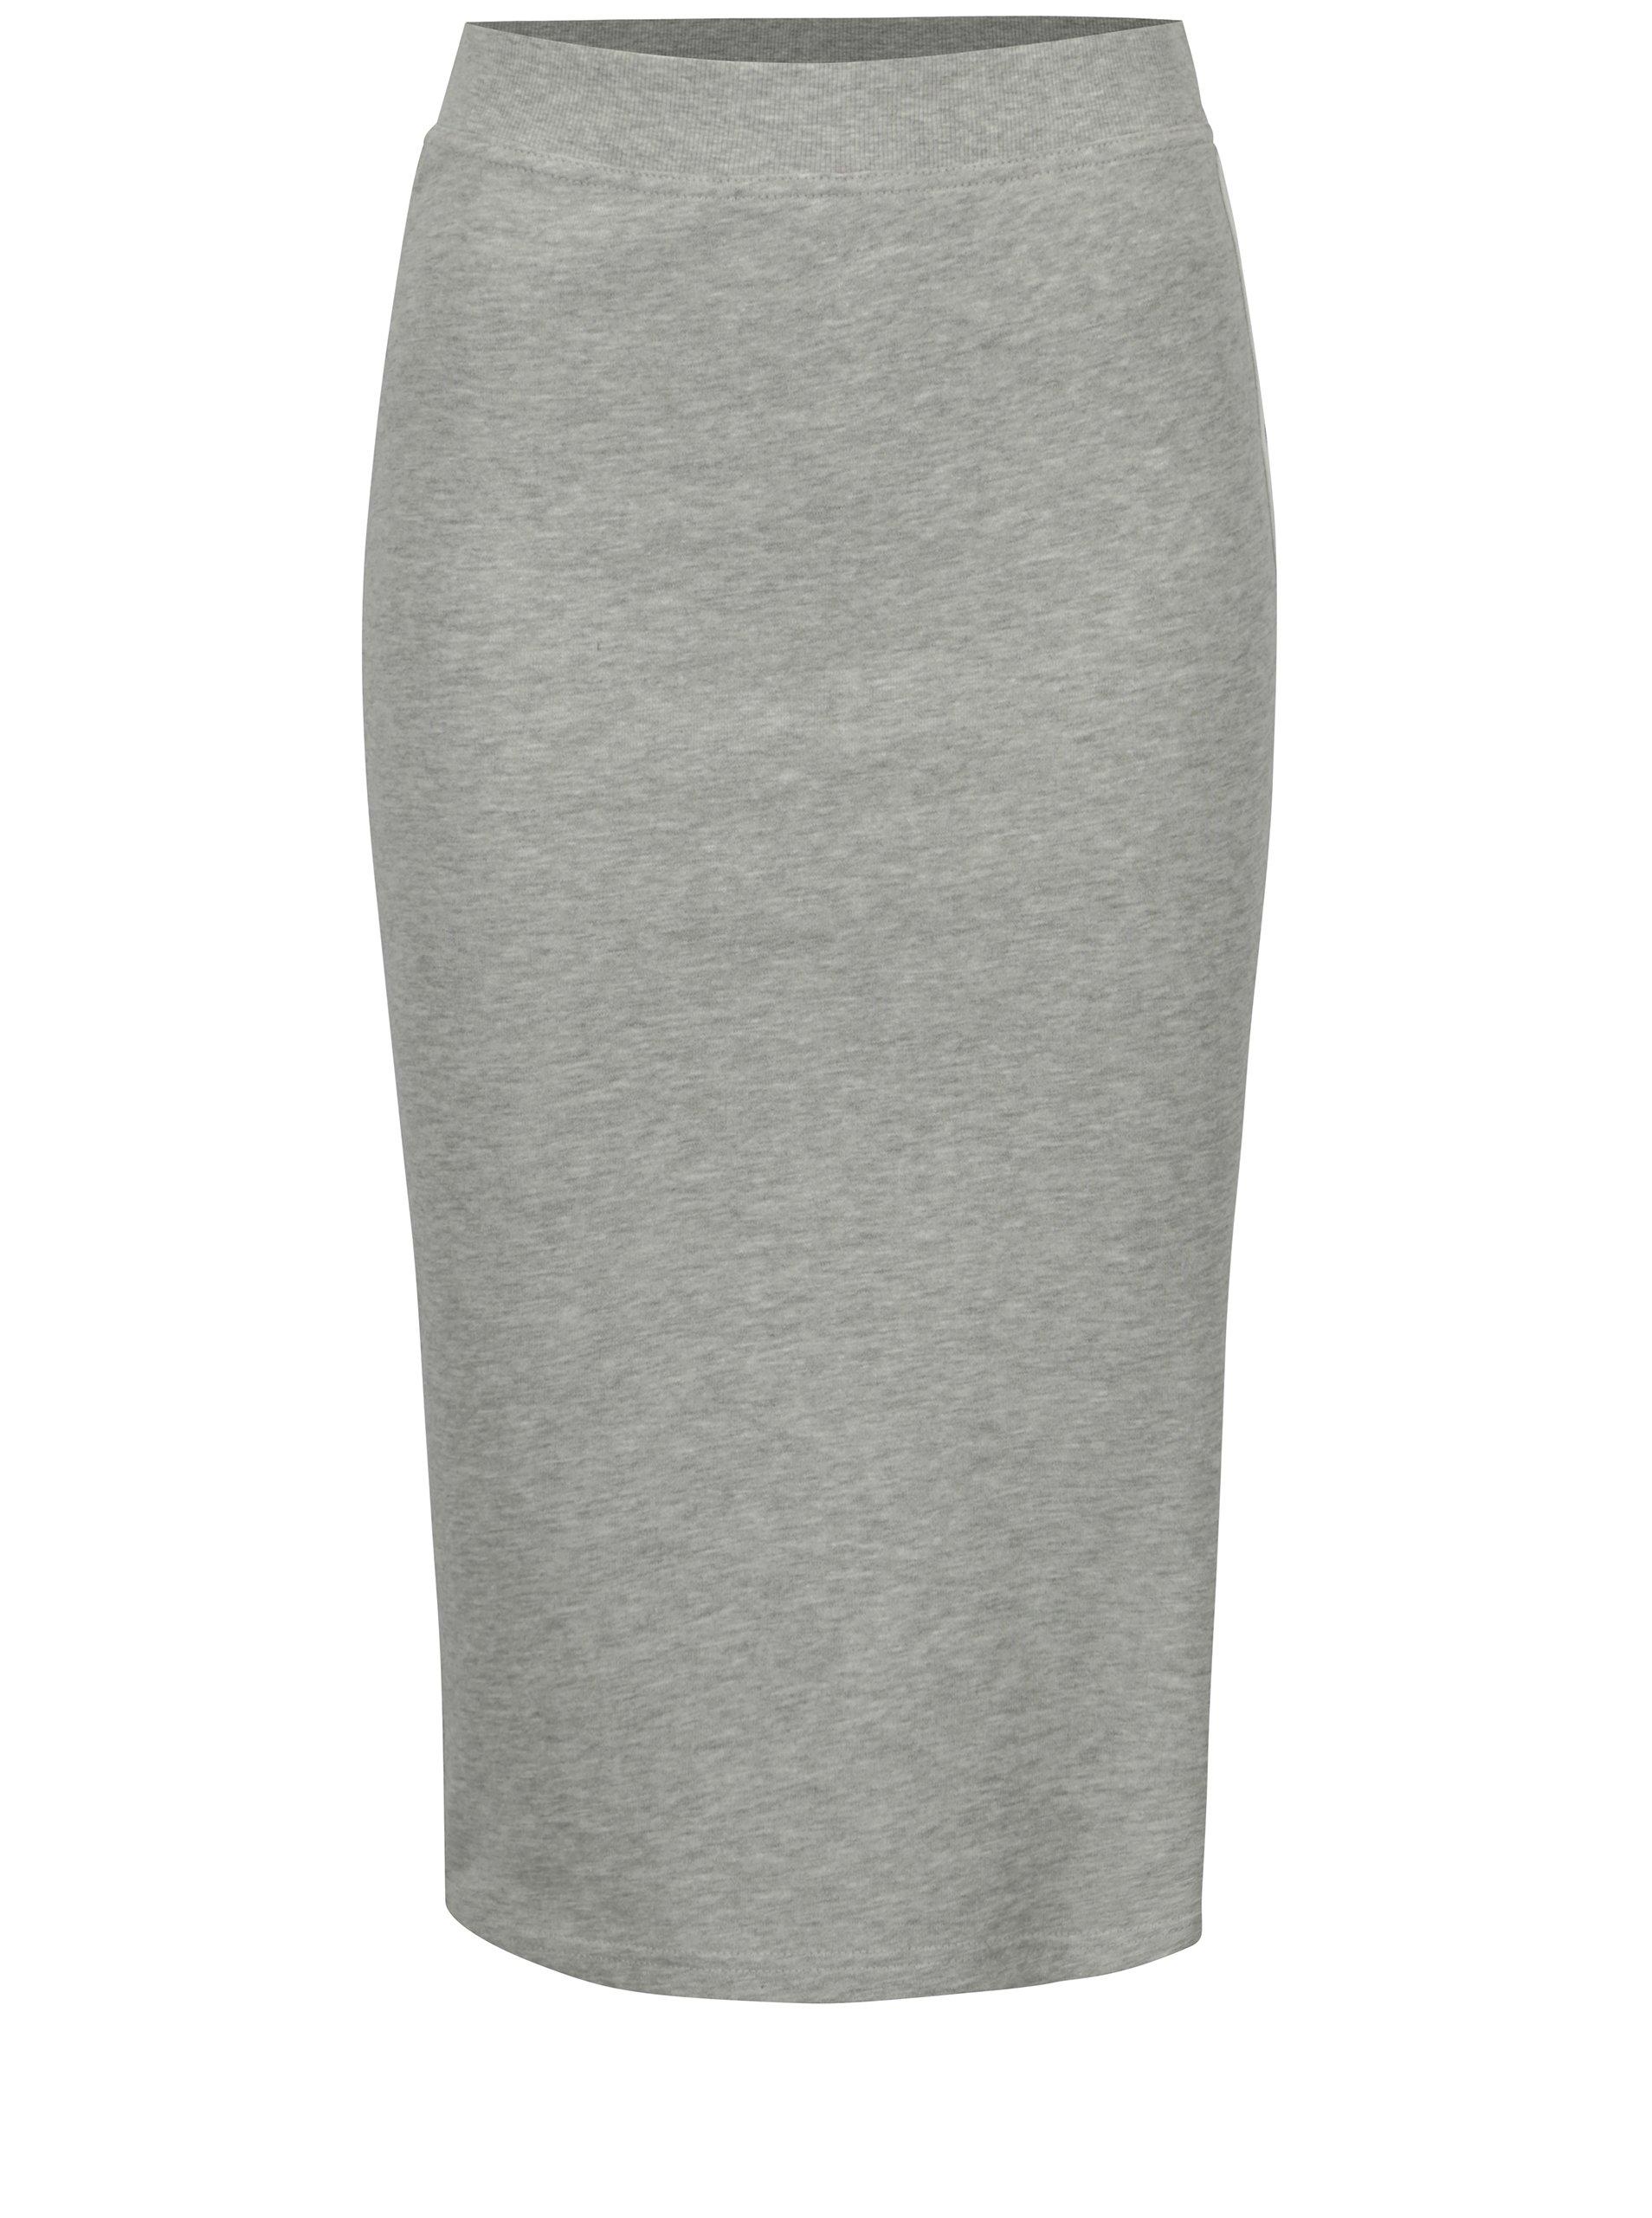 a136b231859c Svetlosivá melírovaná puzdrová sukňa s pruhmi Jacqueline de Yong Celinda